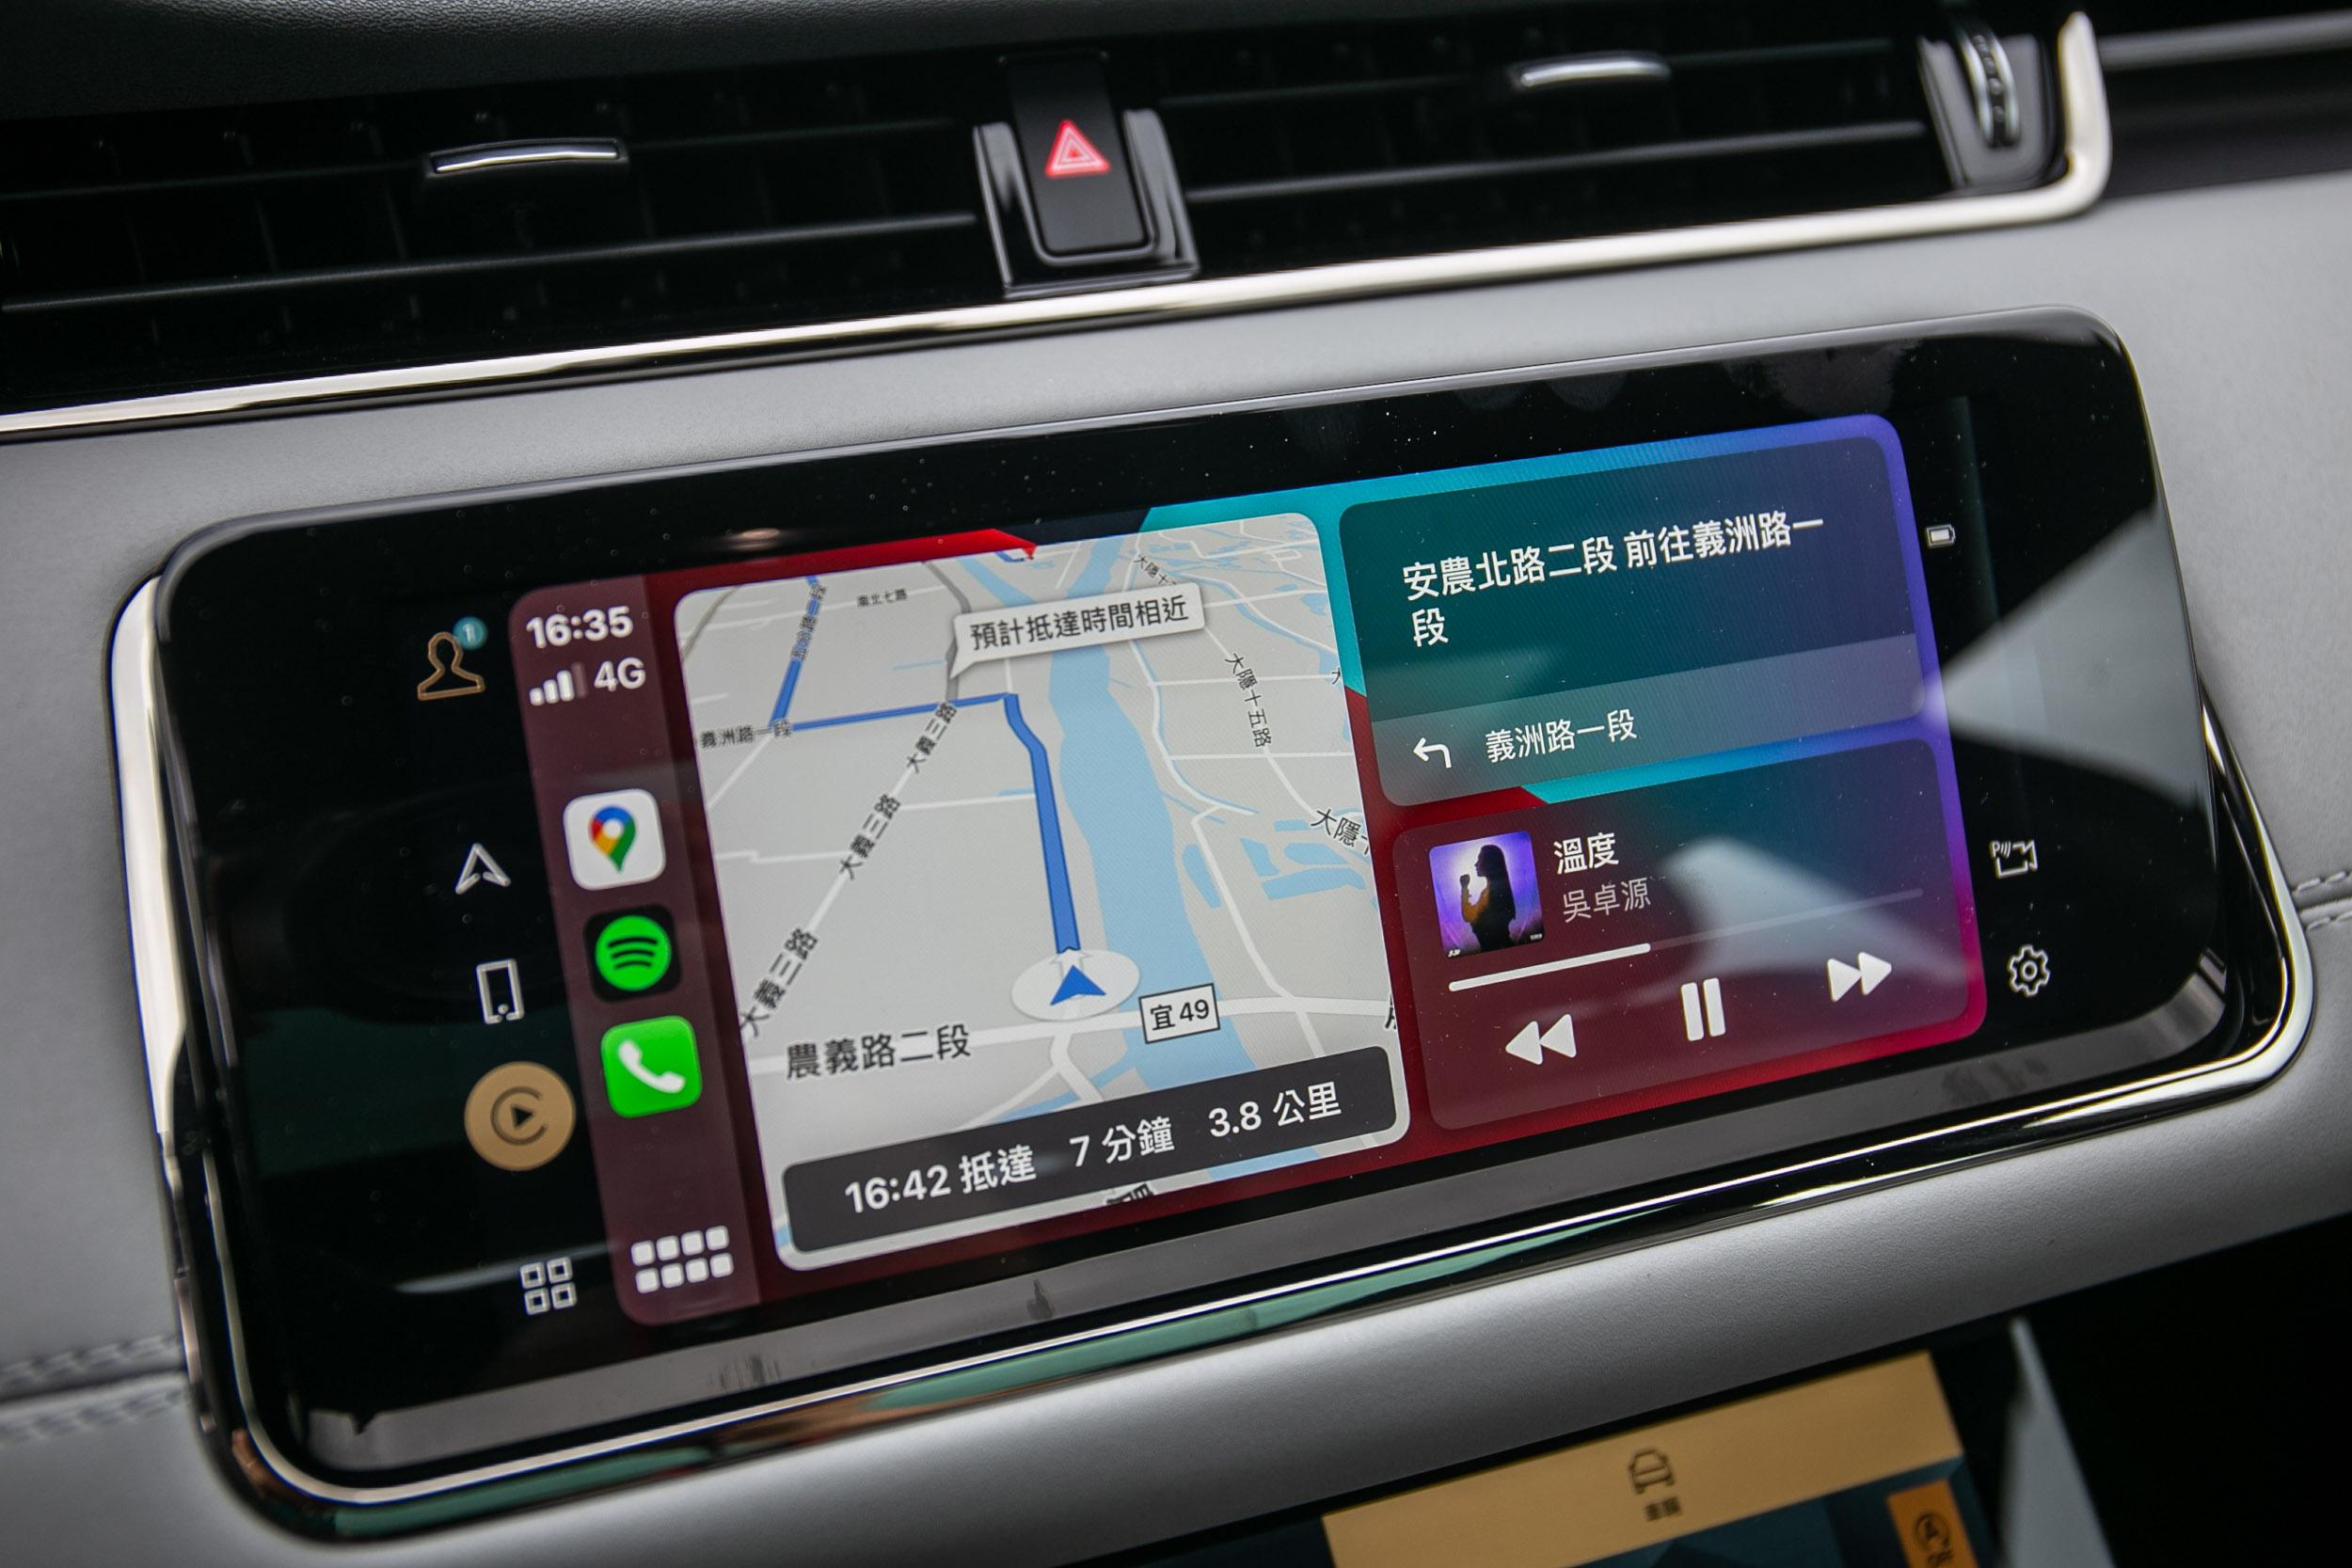 Apple CarPlay 系統連結仍為有線方式。